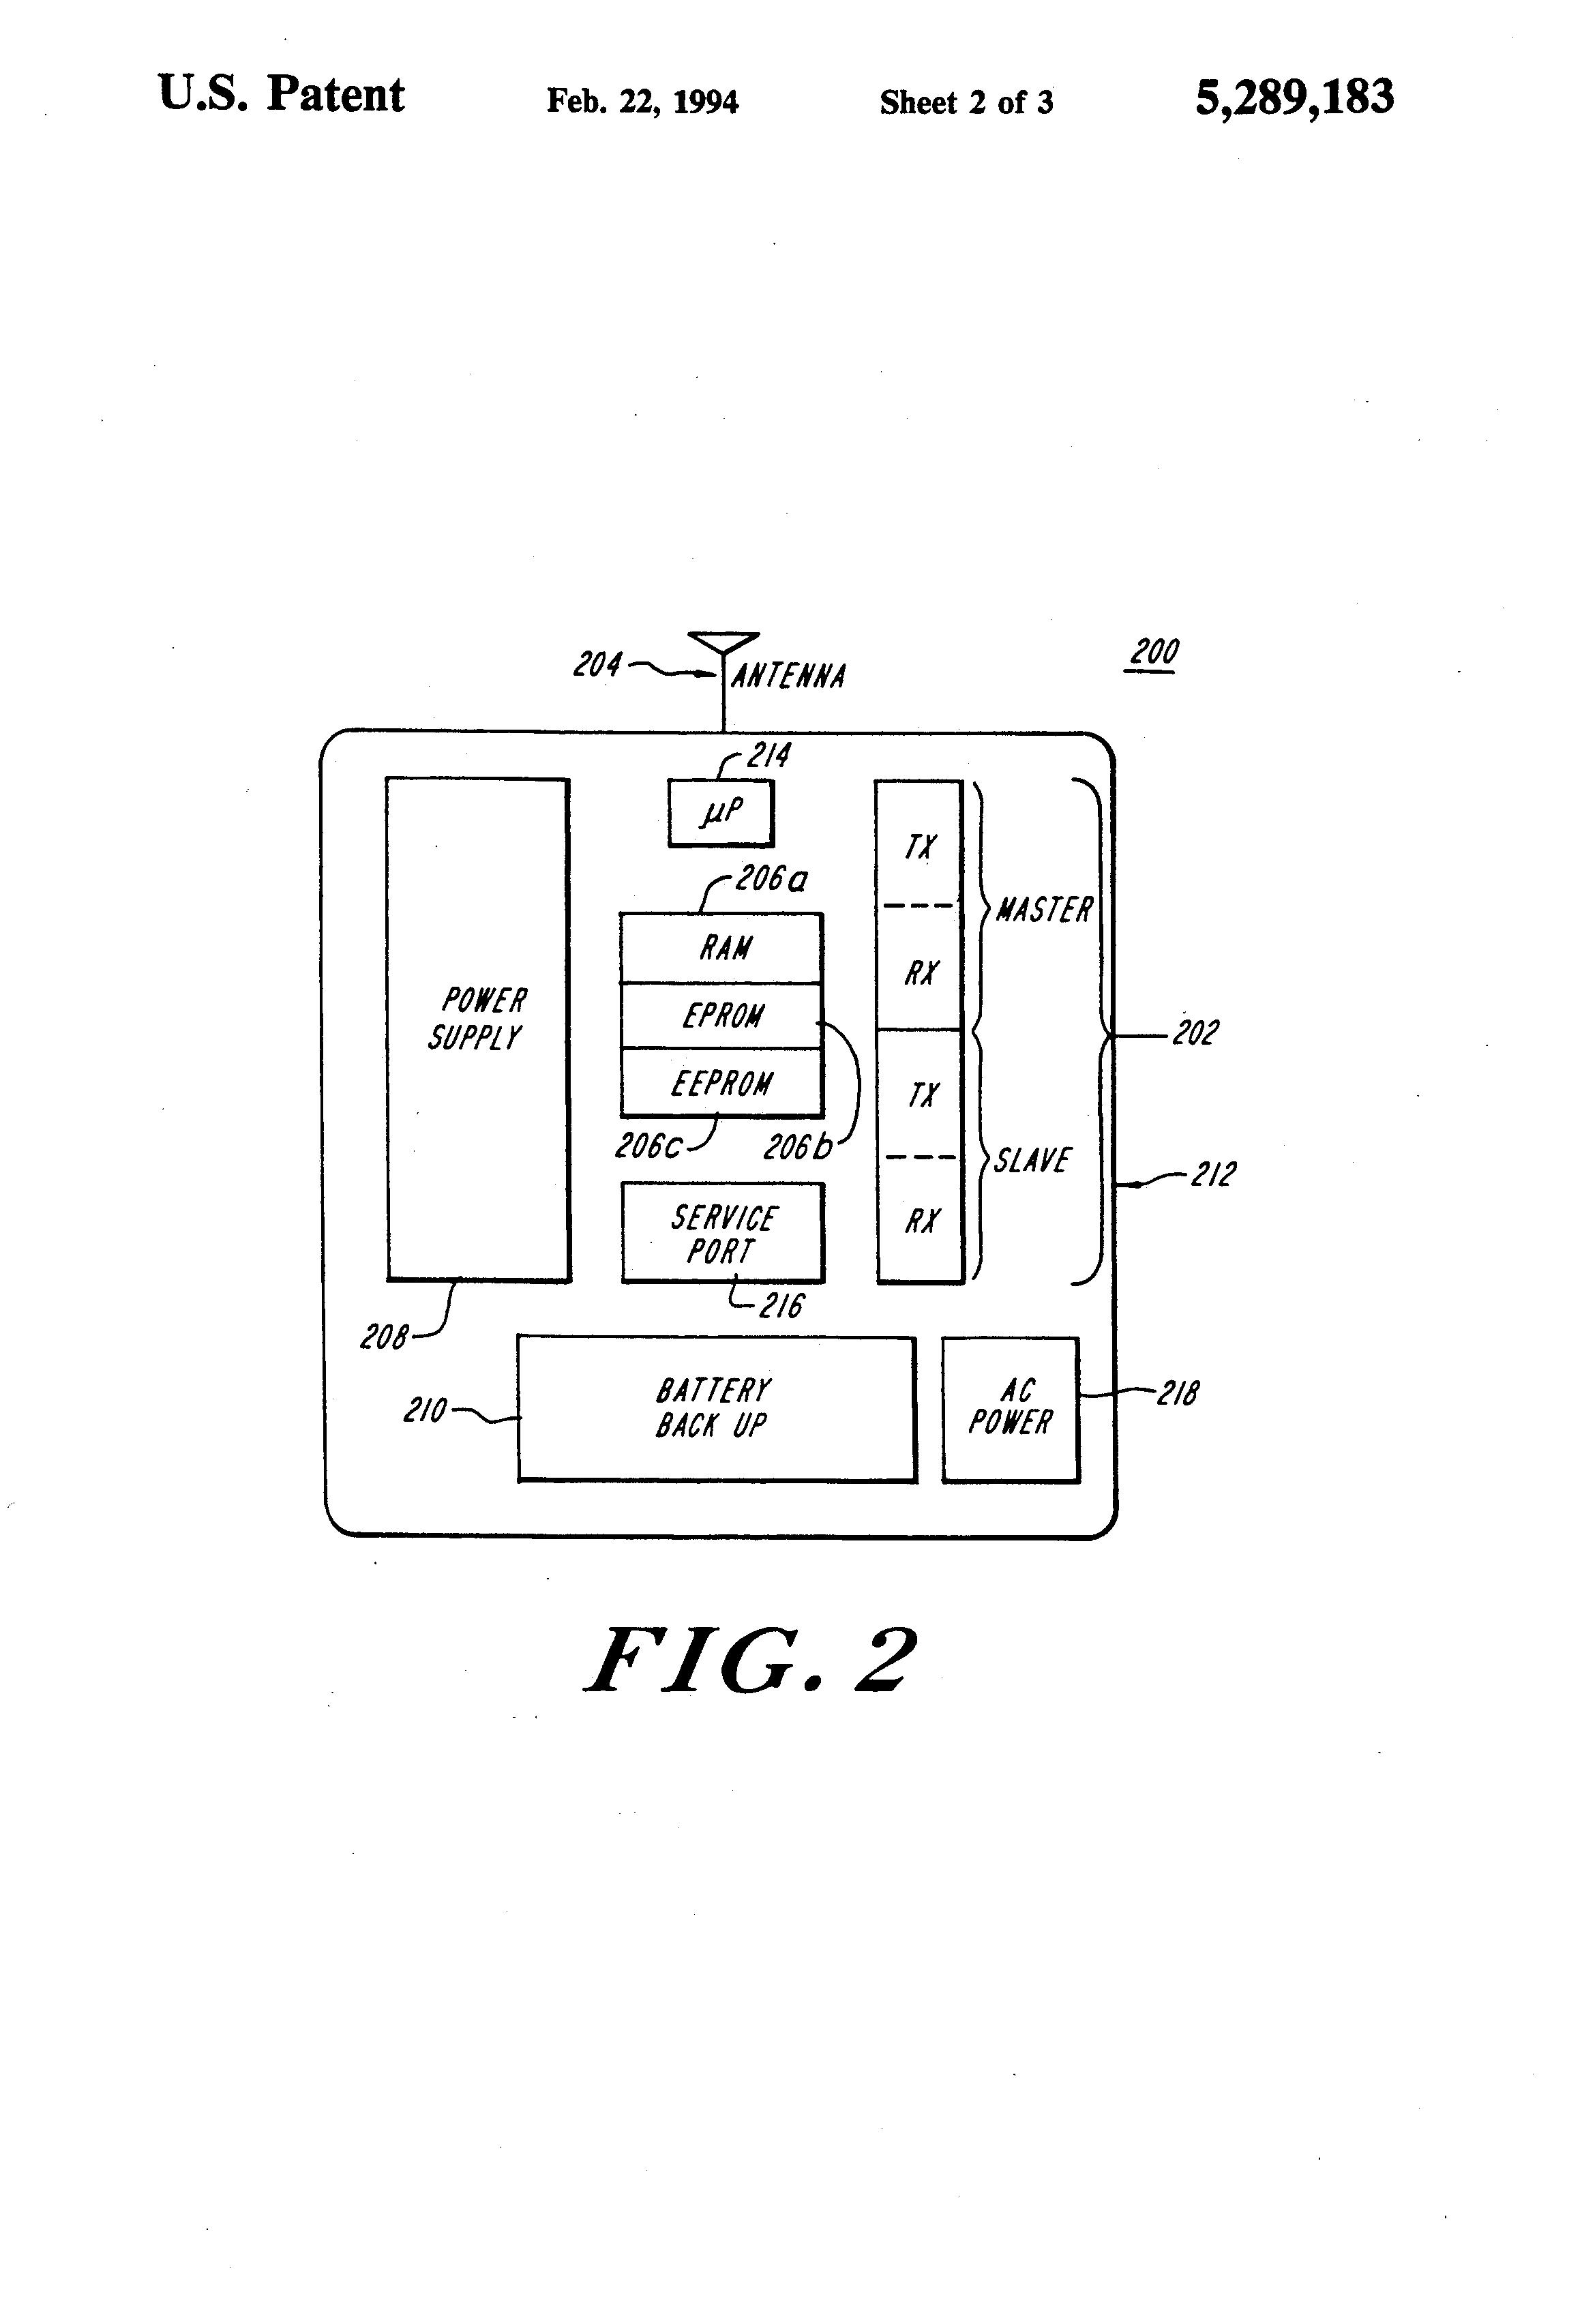 Inductionmotor Control Circuit Diagram Tradeoficcom Wiring Data Electronic Combination Lock Patent Us5289183 Traffic Monitoring And Management Method Rh Google Com Na